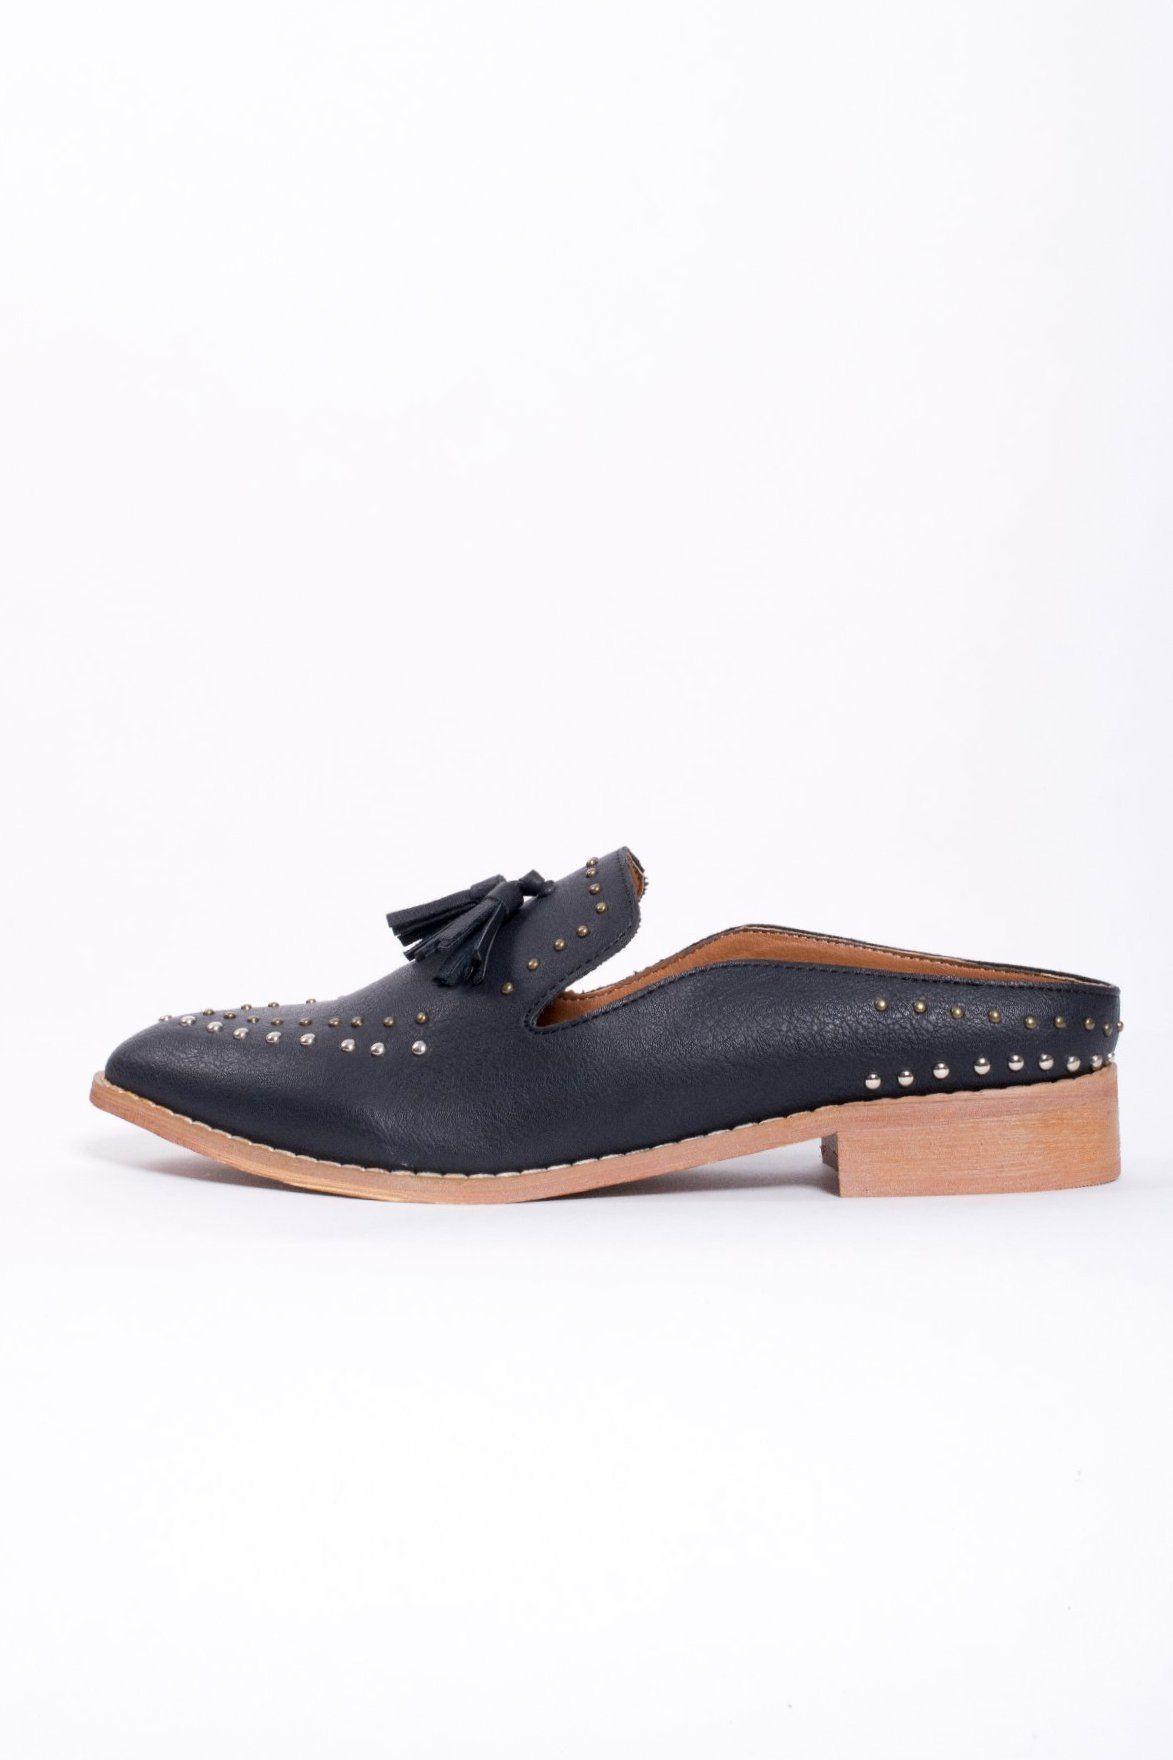 95d0fe60cc6 Montana Studded Tassel Loafer Mule - shoes - Mi iM - MOD SOUL